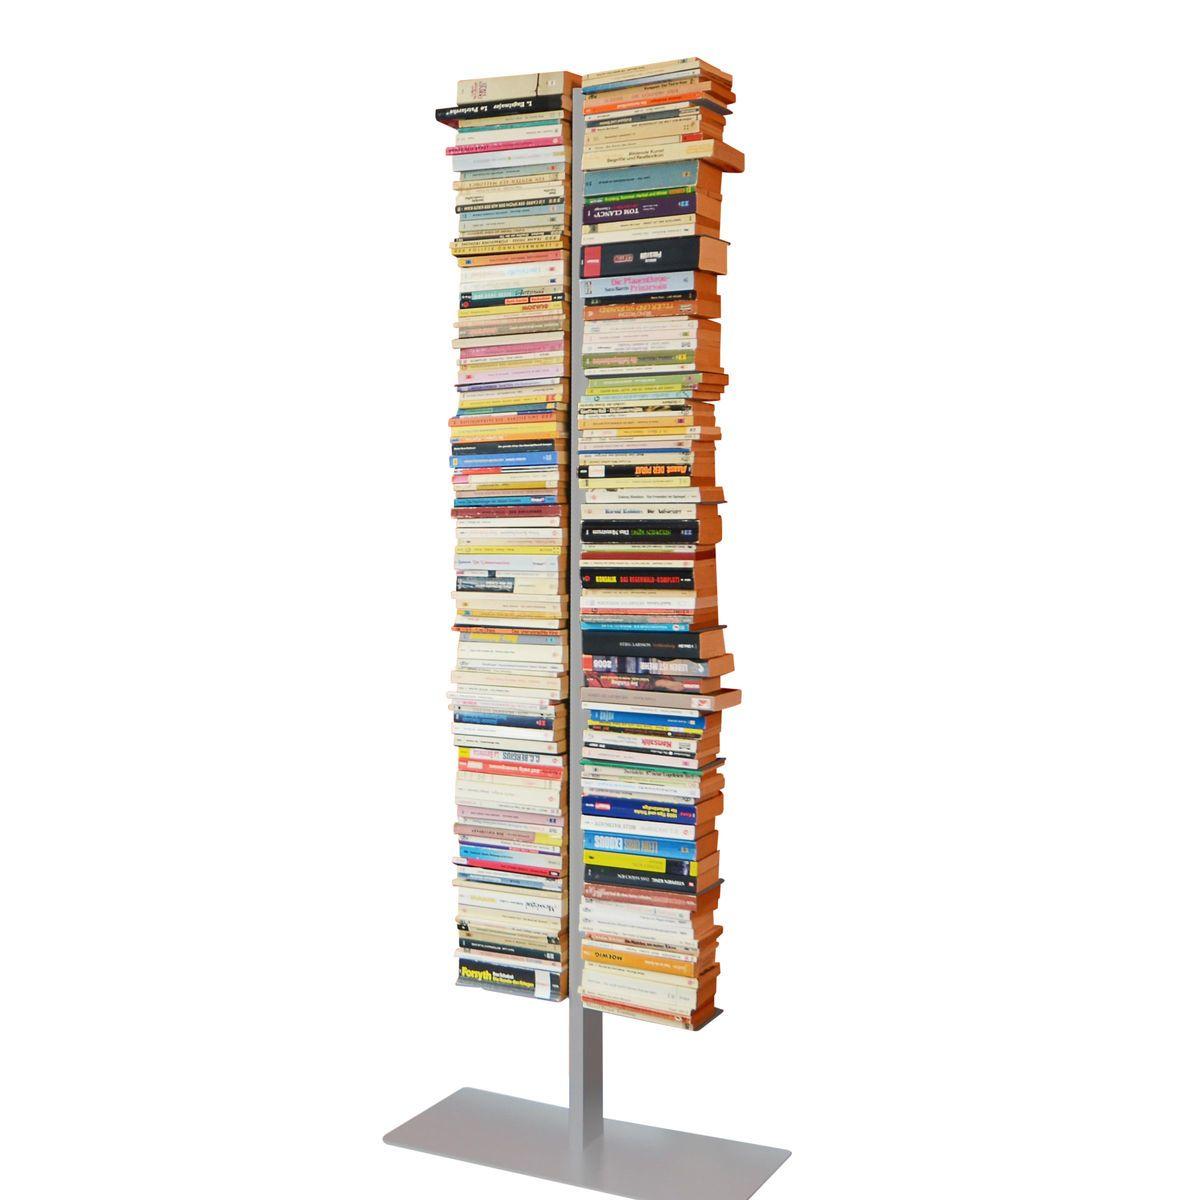 booksbaum book stand large radius. Black Bedroom Furniture Sets. Home Design Ideas